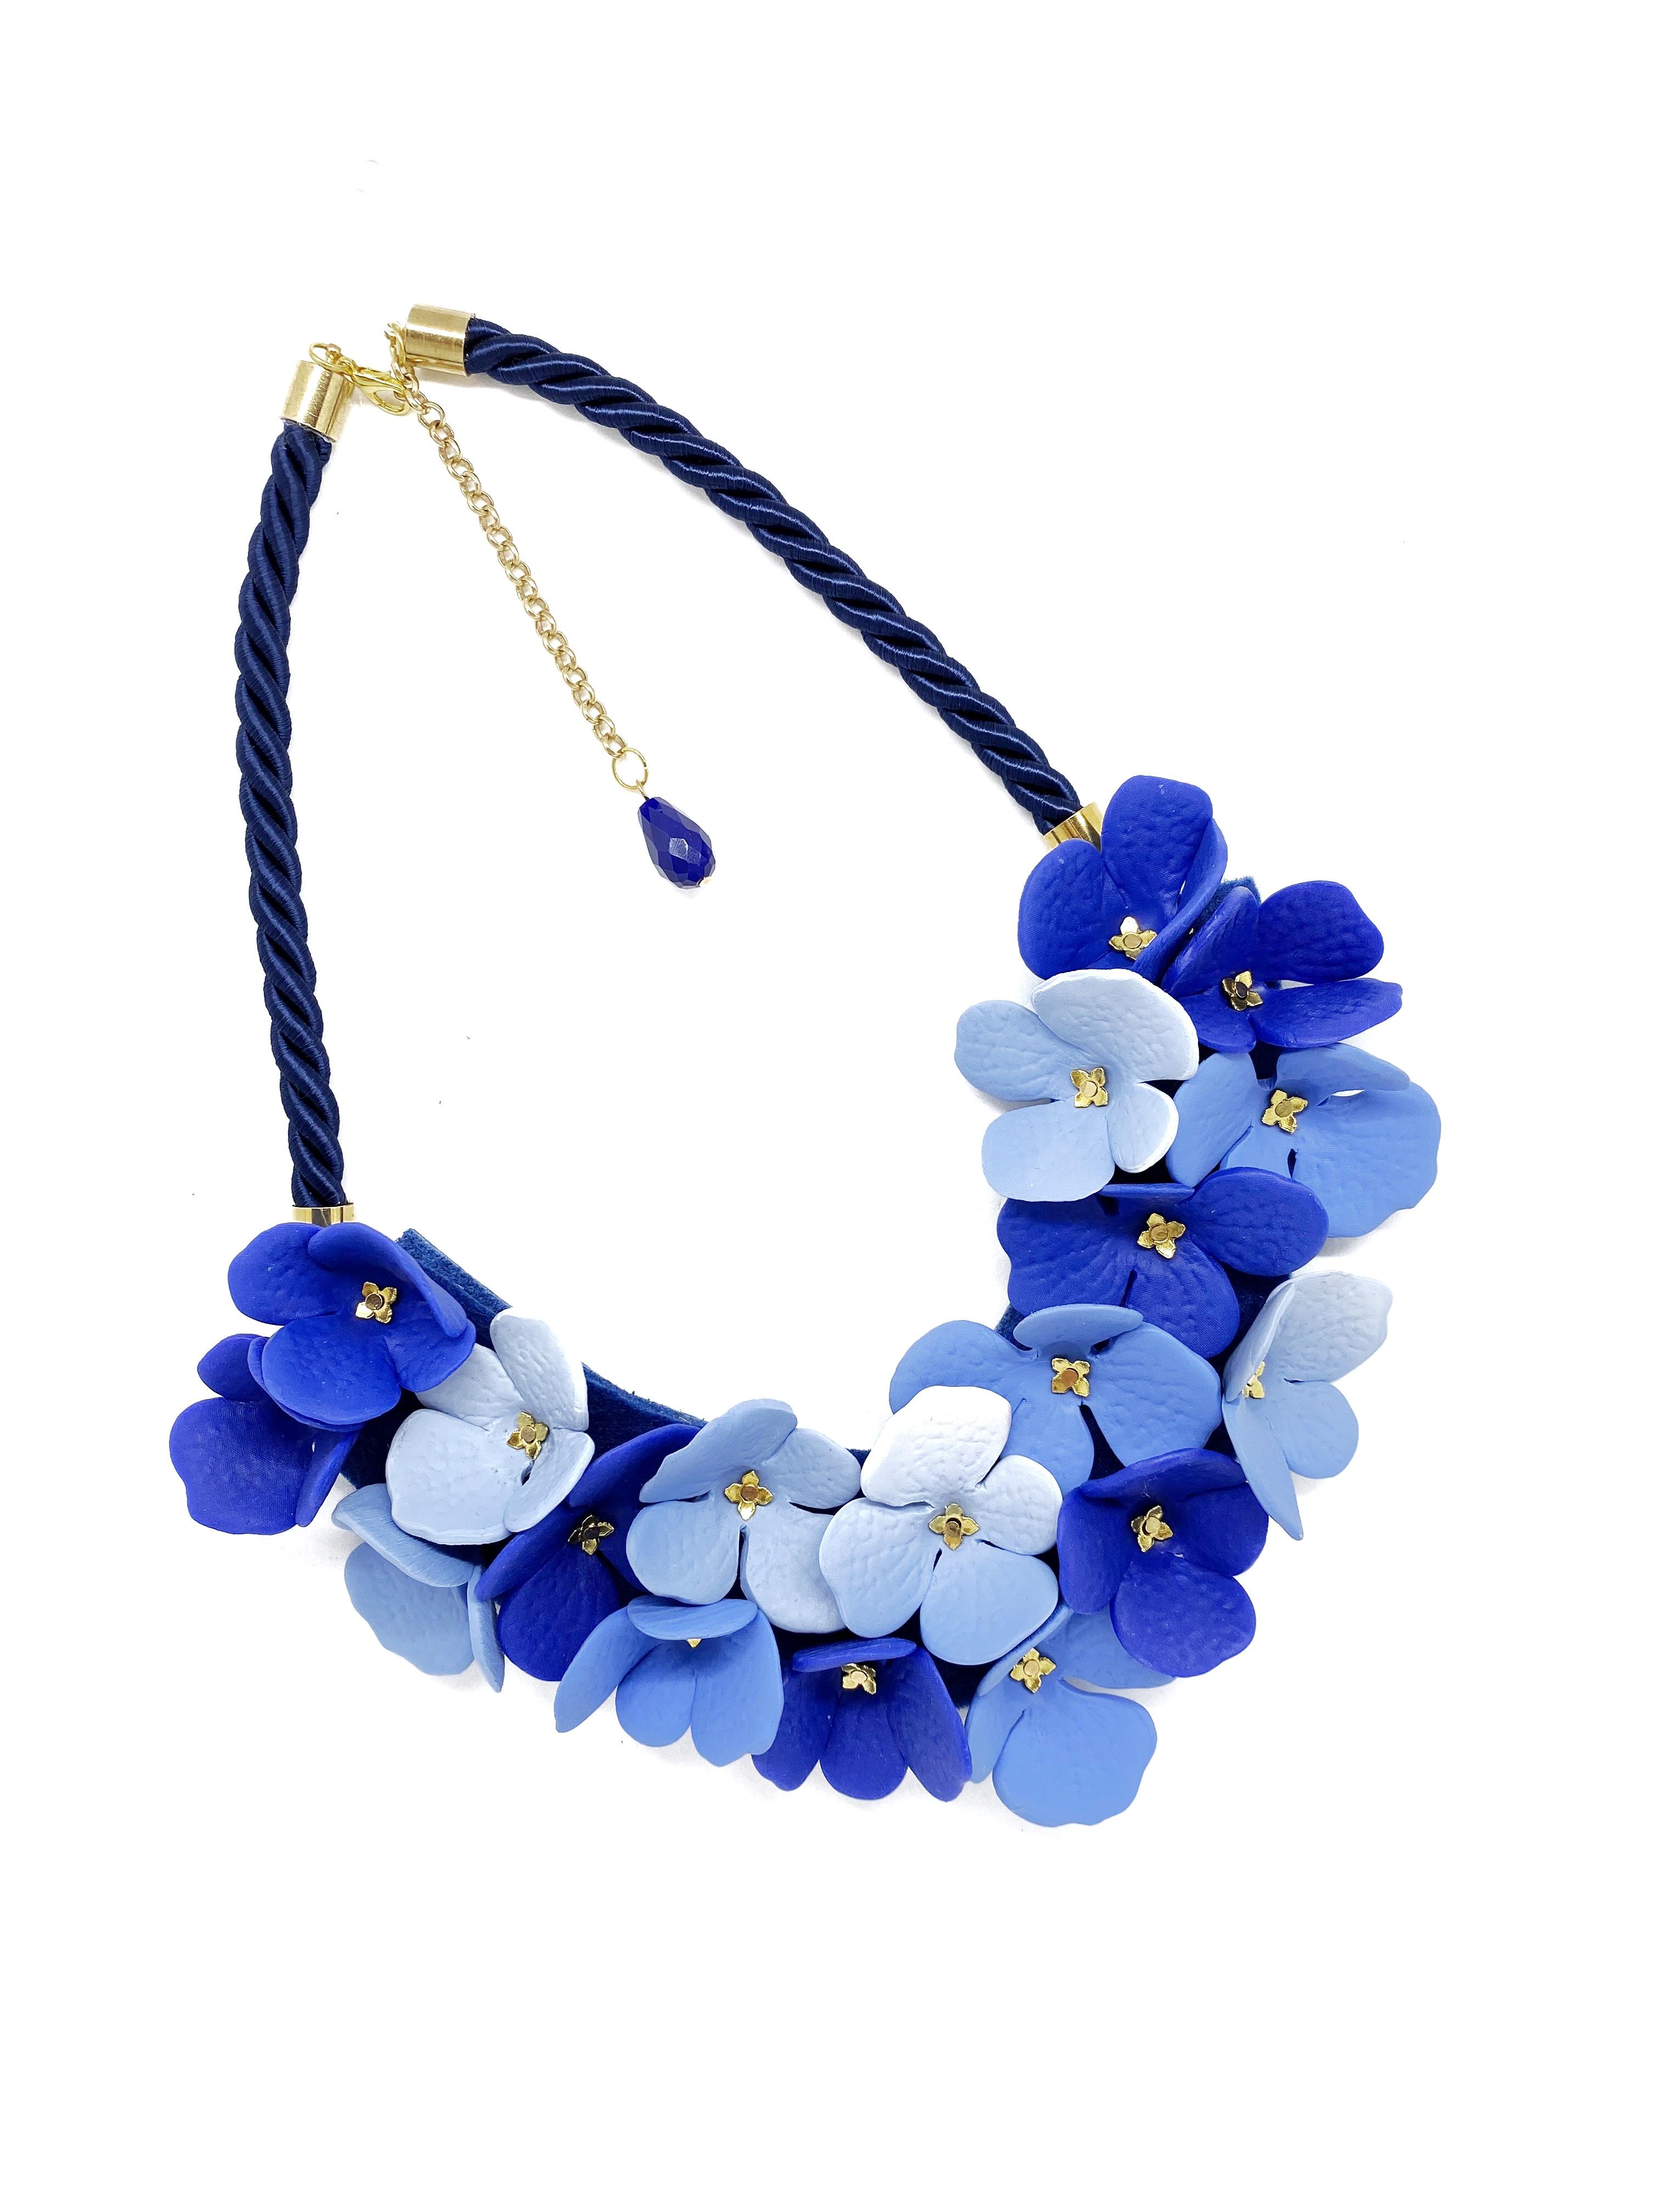 Hydrengens inspired cobalt blue and ligh